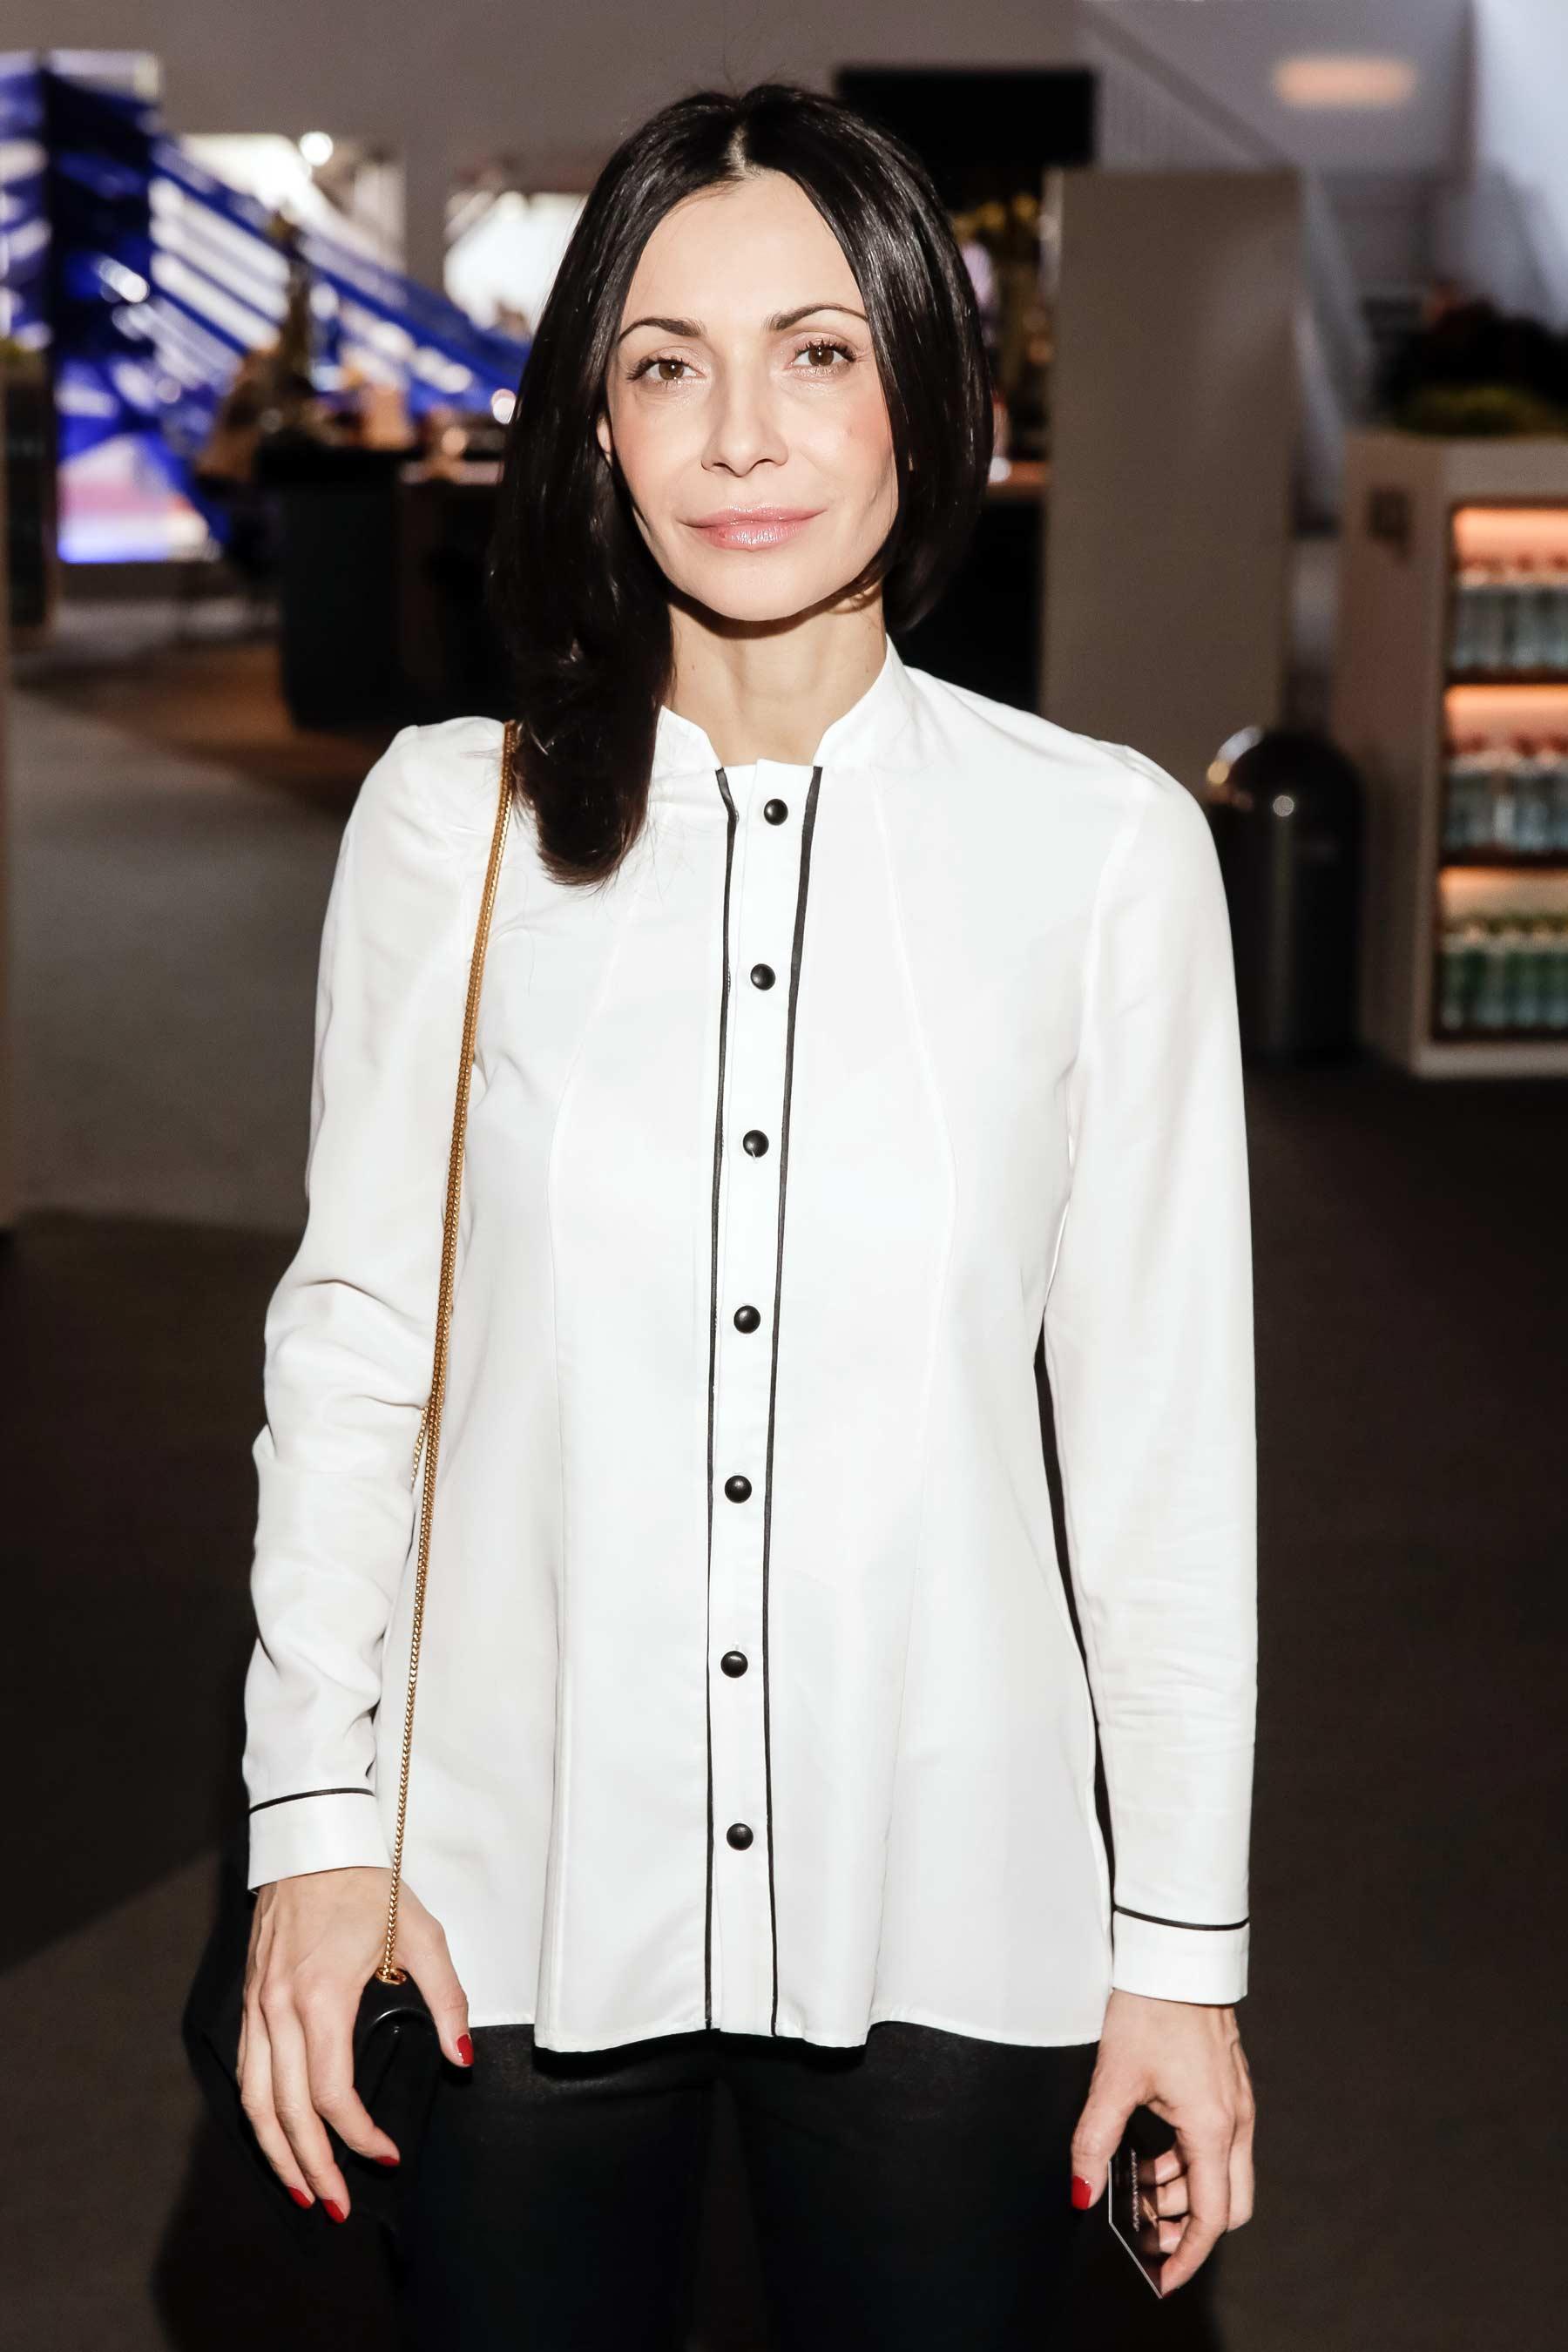 German celebs attend Mercedes Benz Fashion Week